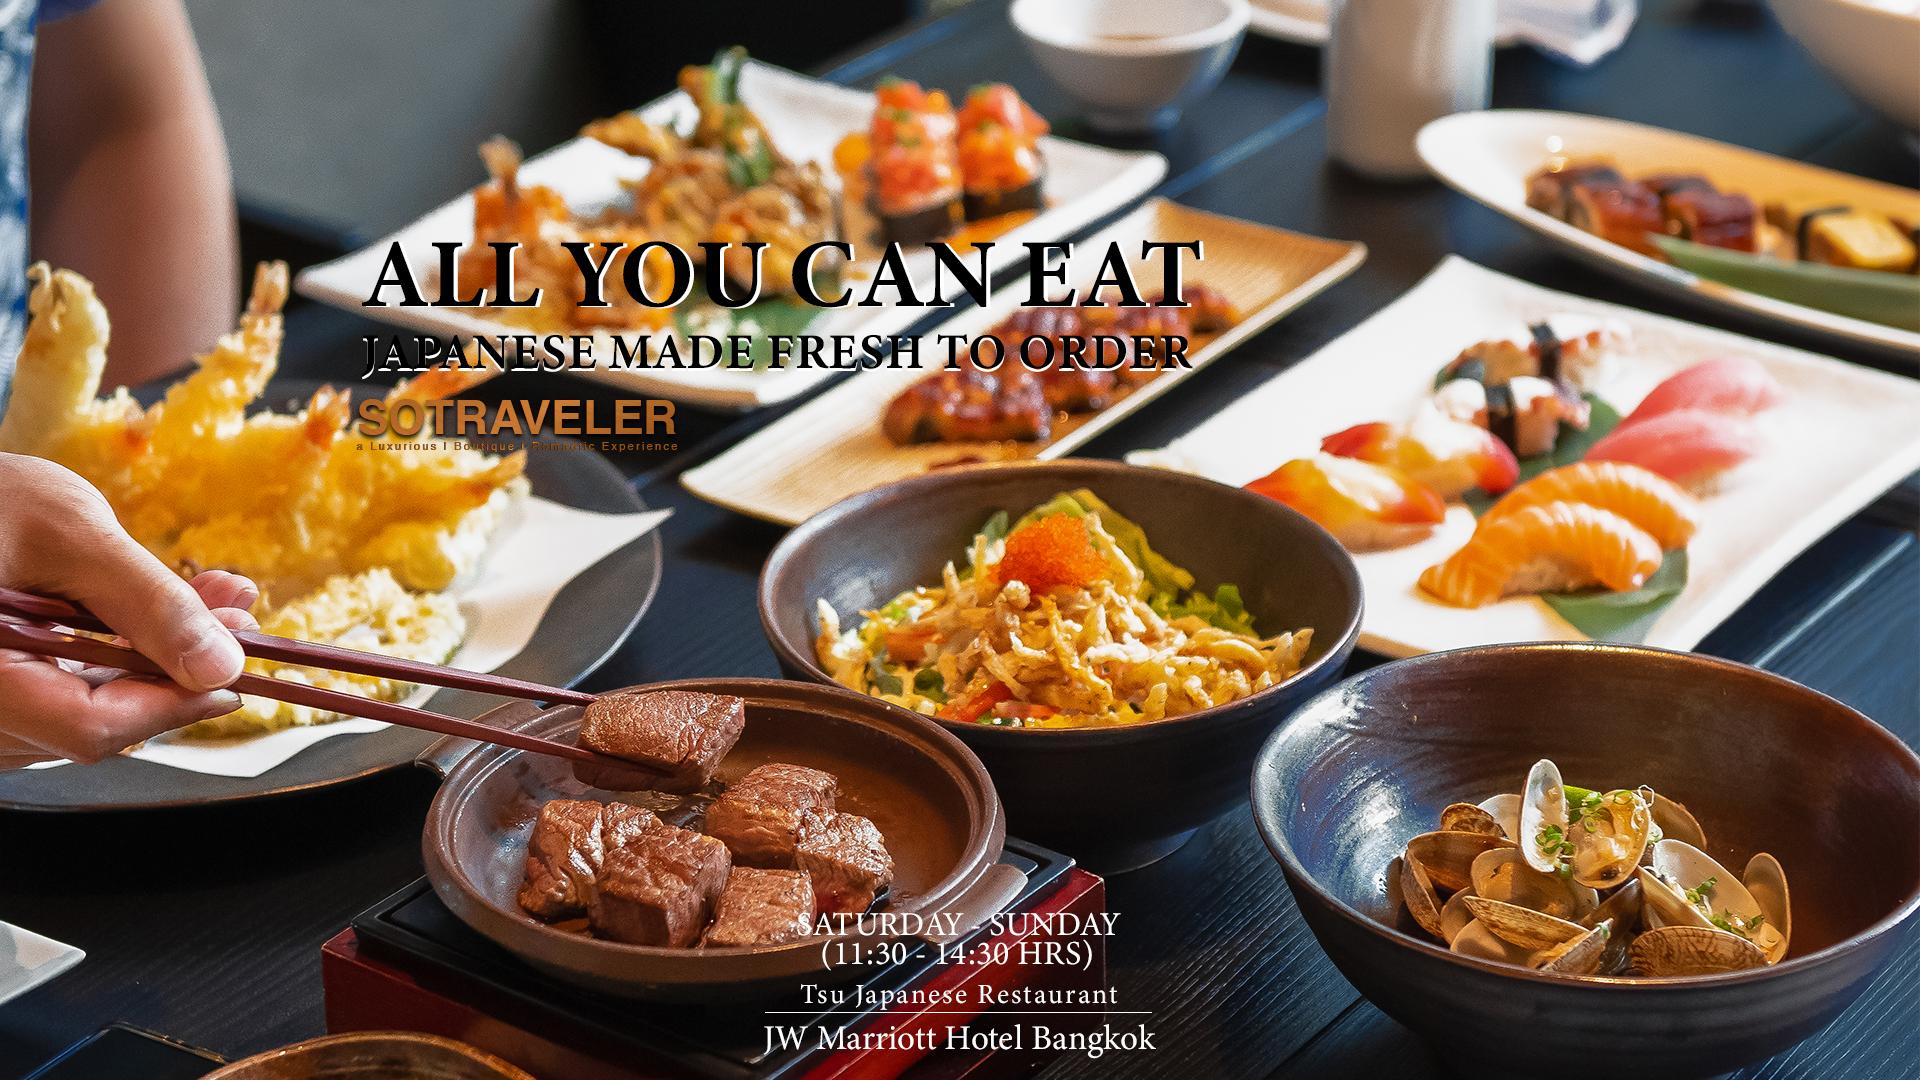 Tsu Japanese Cuisine Buffet JW Marriott Hotel Bangkok